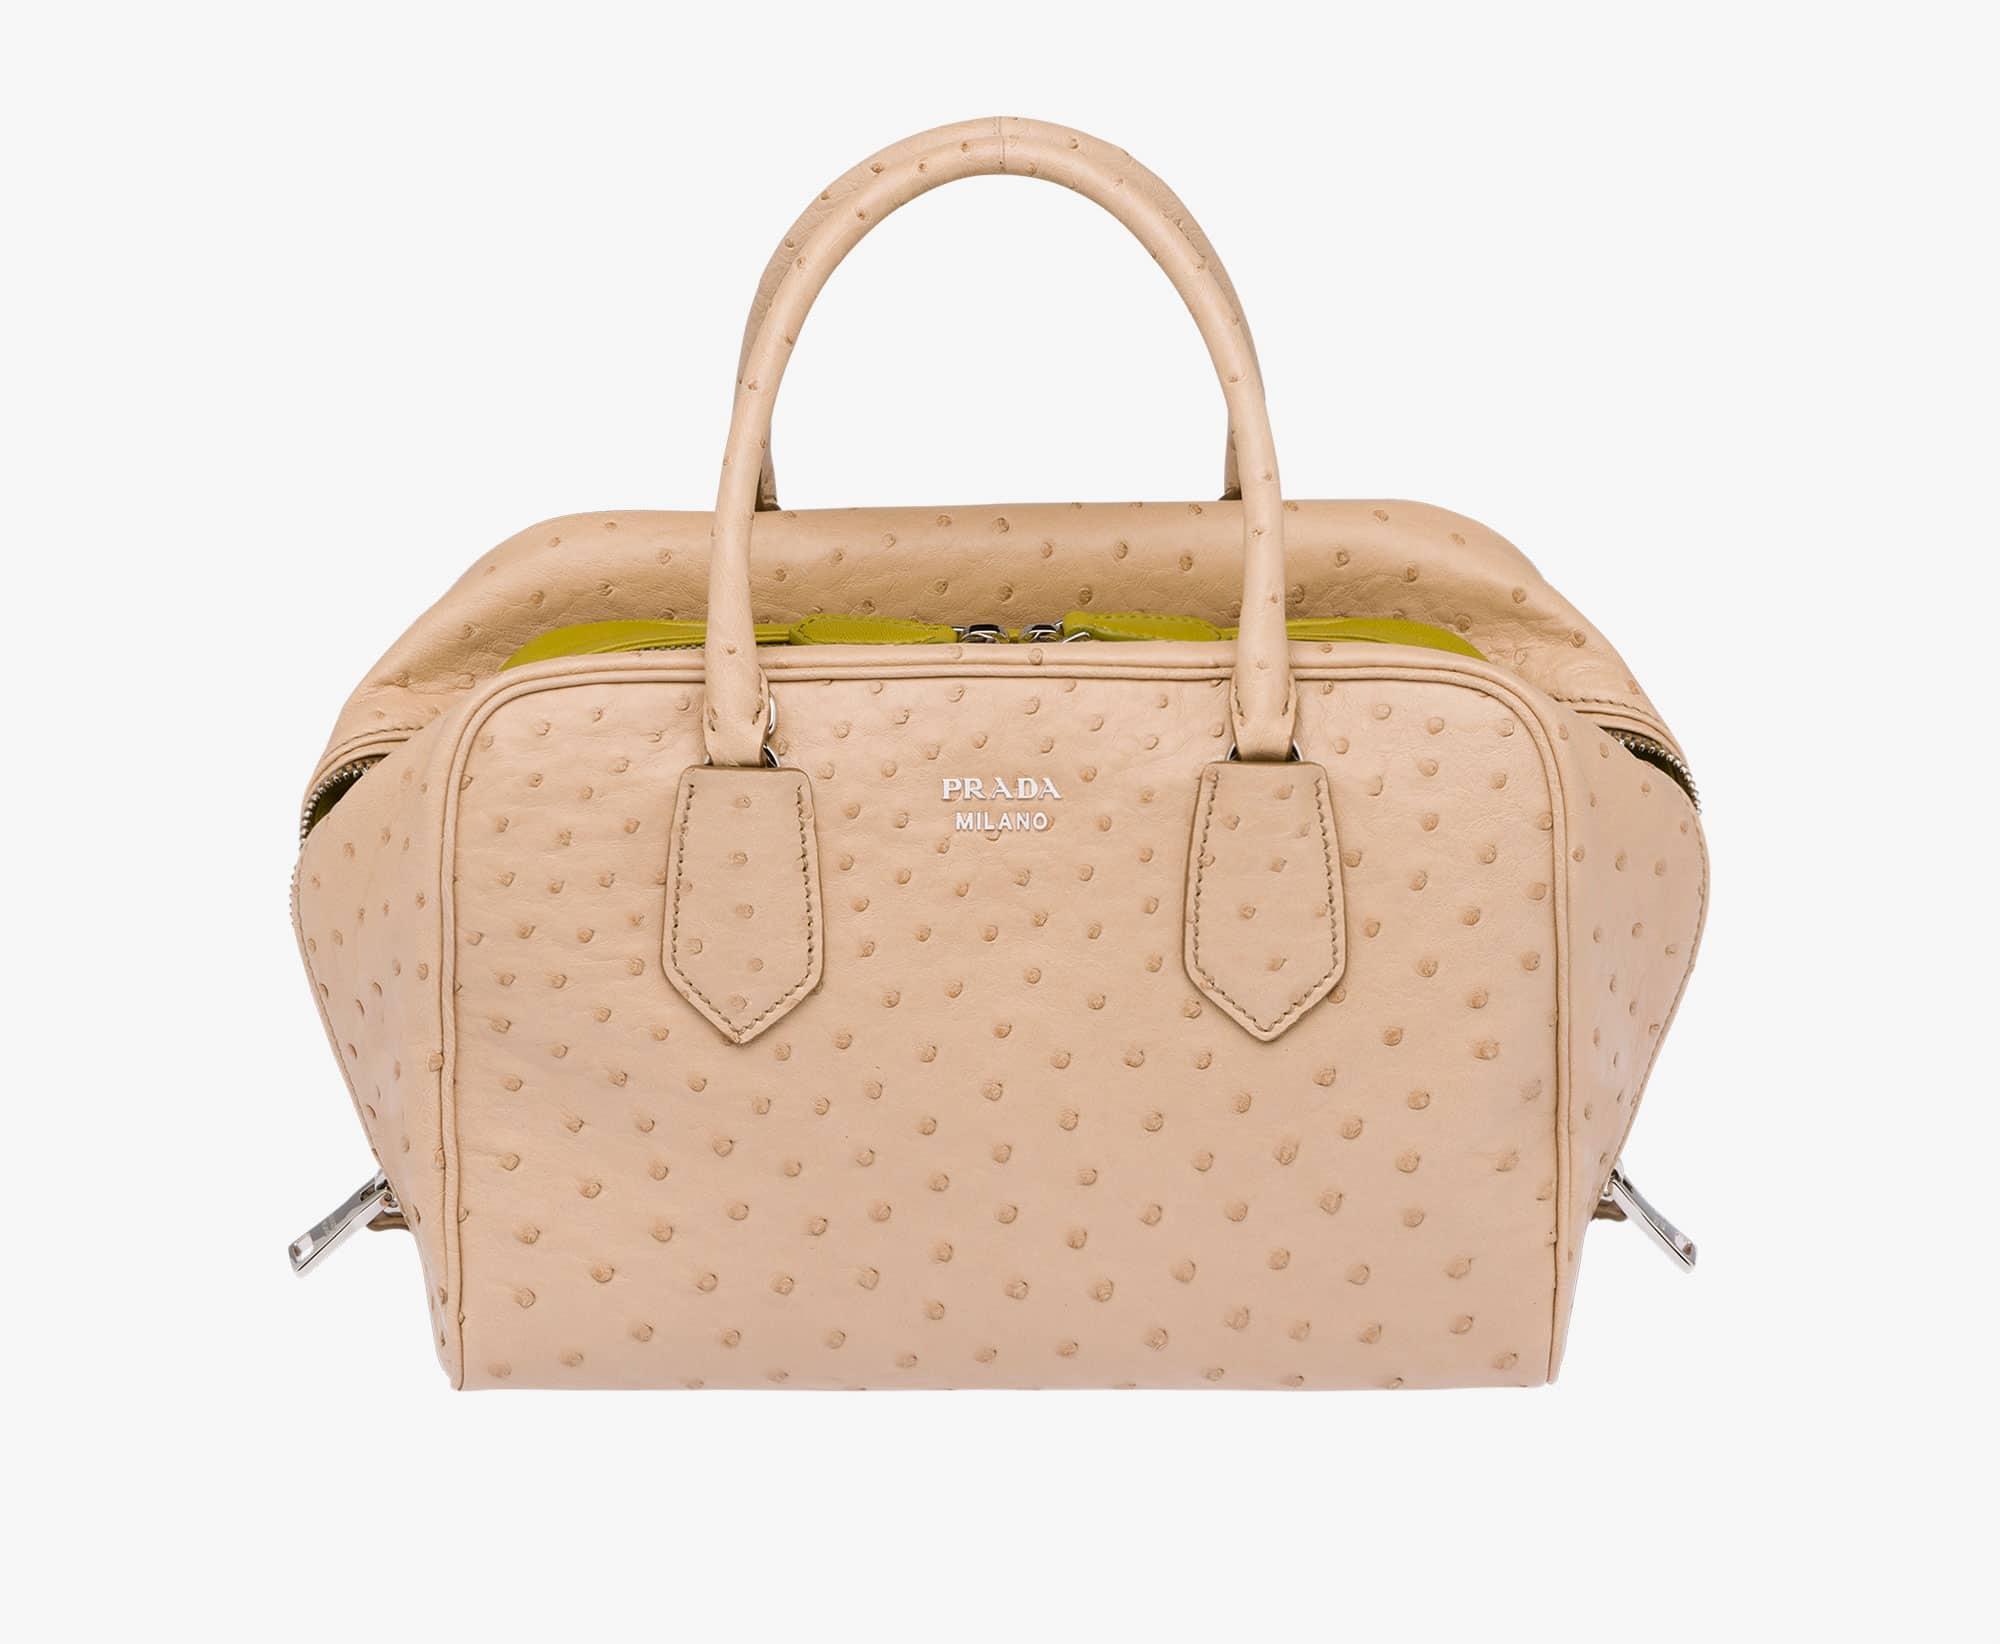 prada copy bags - Prada Inside Tote Bag Reference Guide | Spotted Fashion